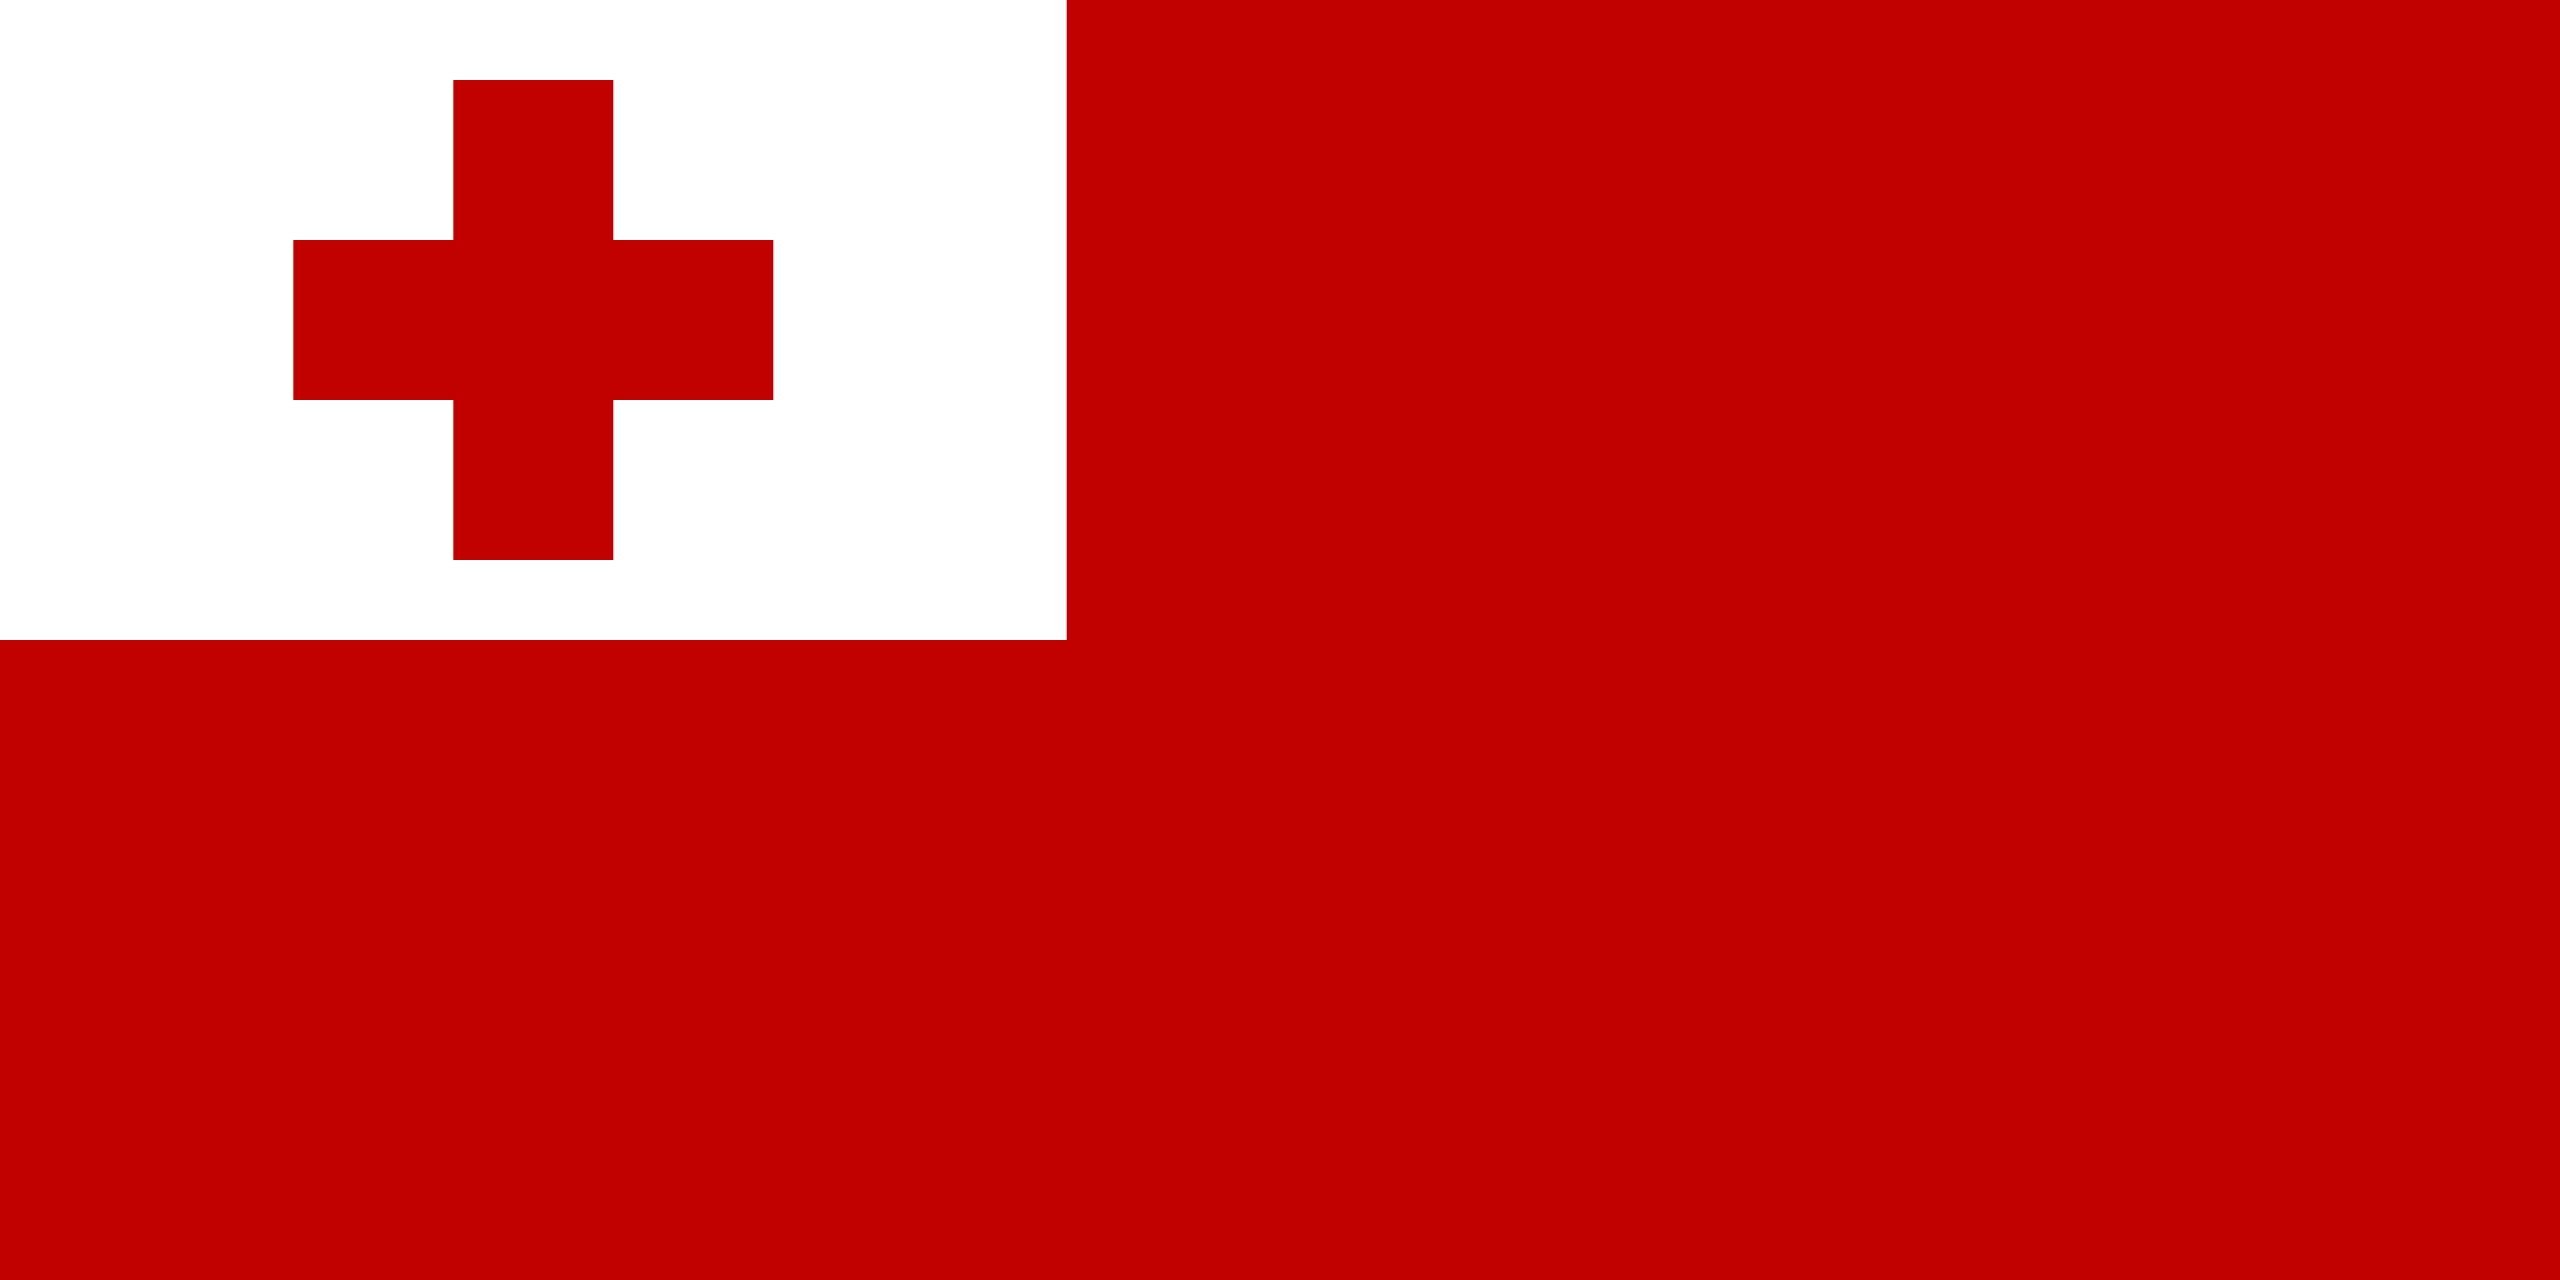 tonga, paese, emblema, logo, simbolo - Sfondi HD - Professor-falken.com